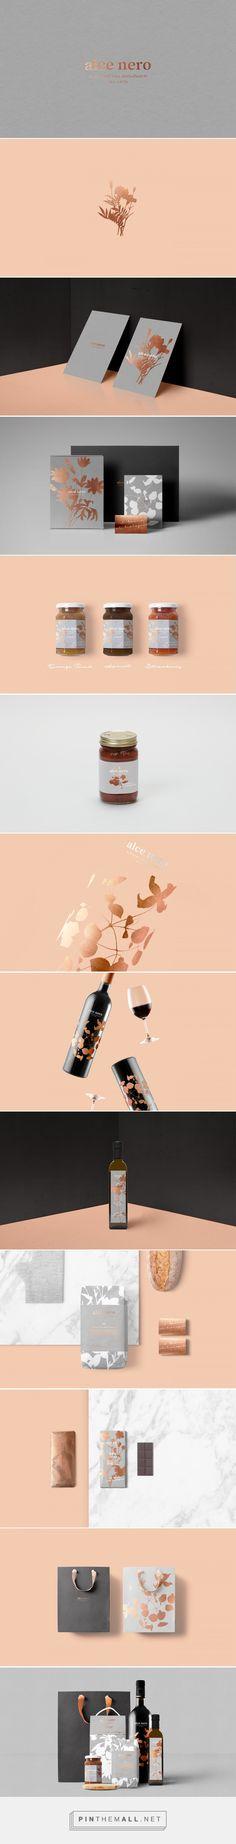 Alce Nero Packaging Redesign on Behance Fivestar Branding – Design and… Corporate Design, Brand Identity Design, Graphic Design Branding, Corporate Identity, Brochure Design, Visual Identity, Layout Design, Graphisches Design, Label Design